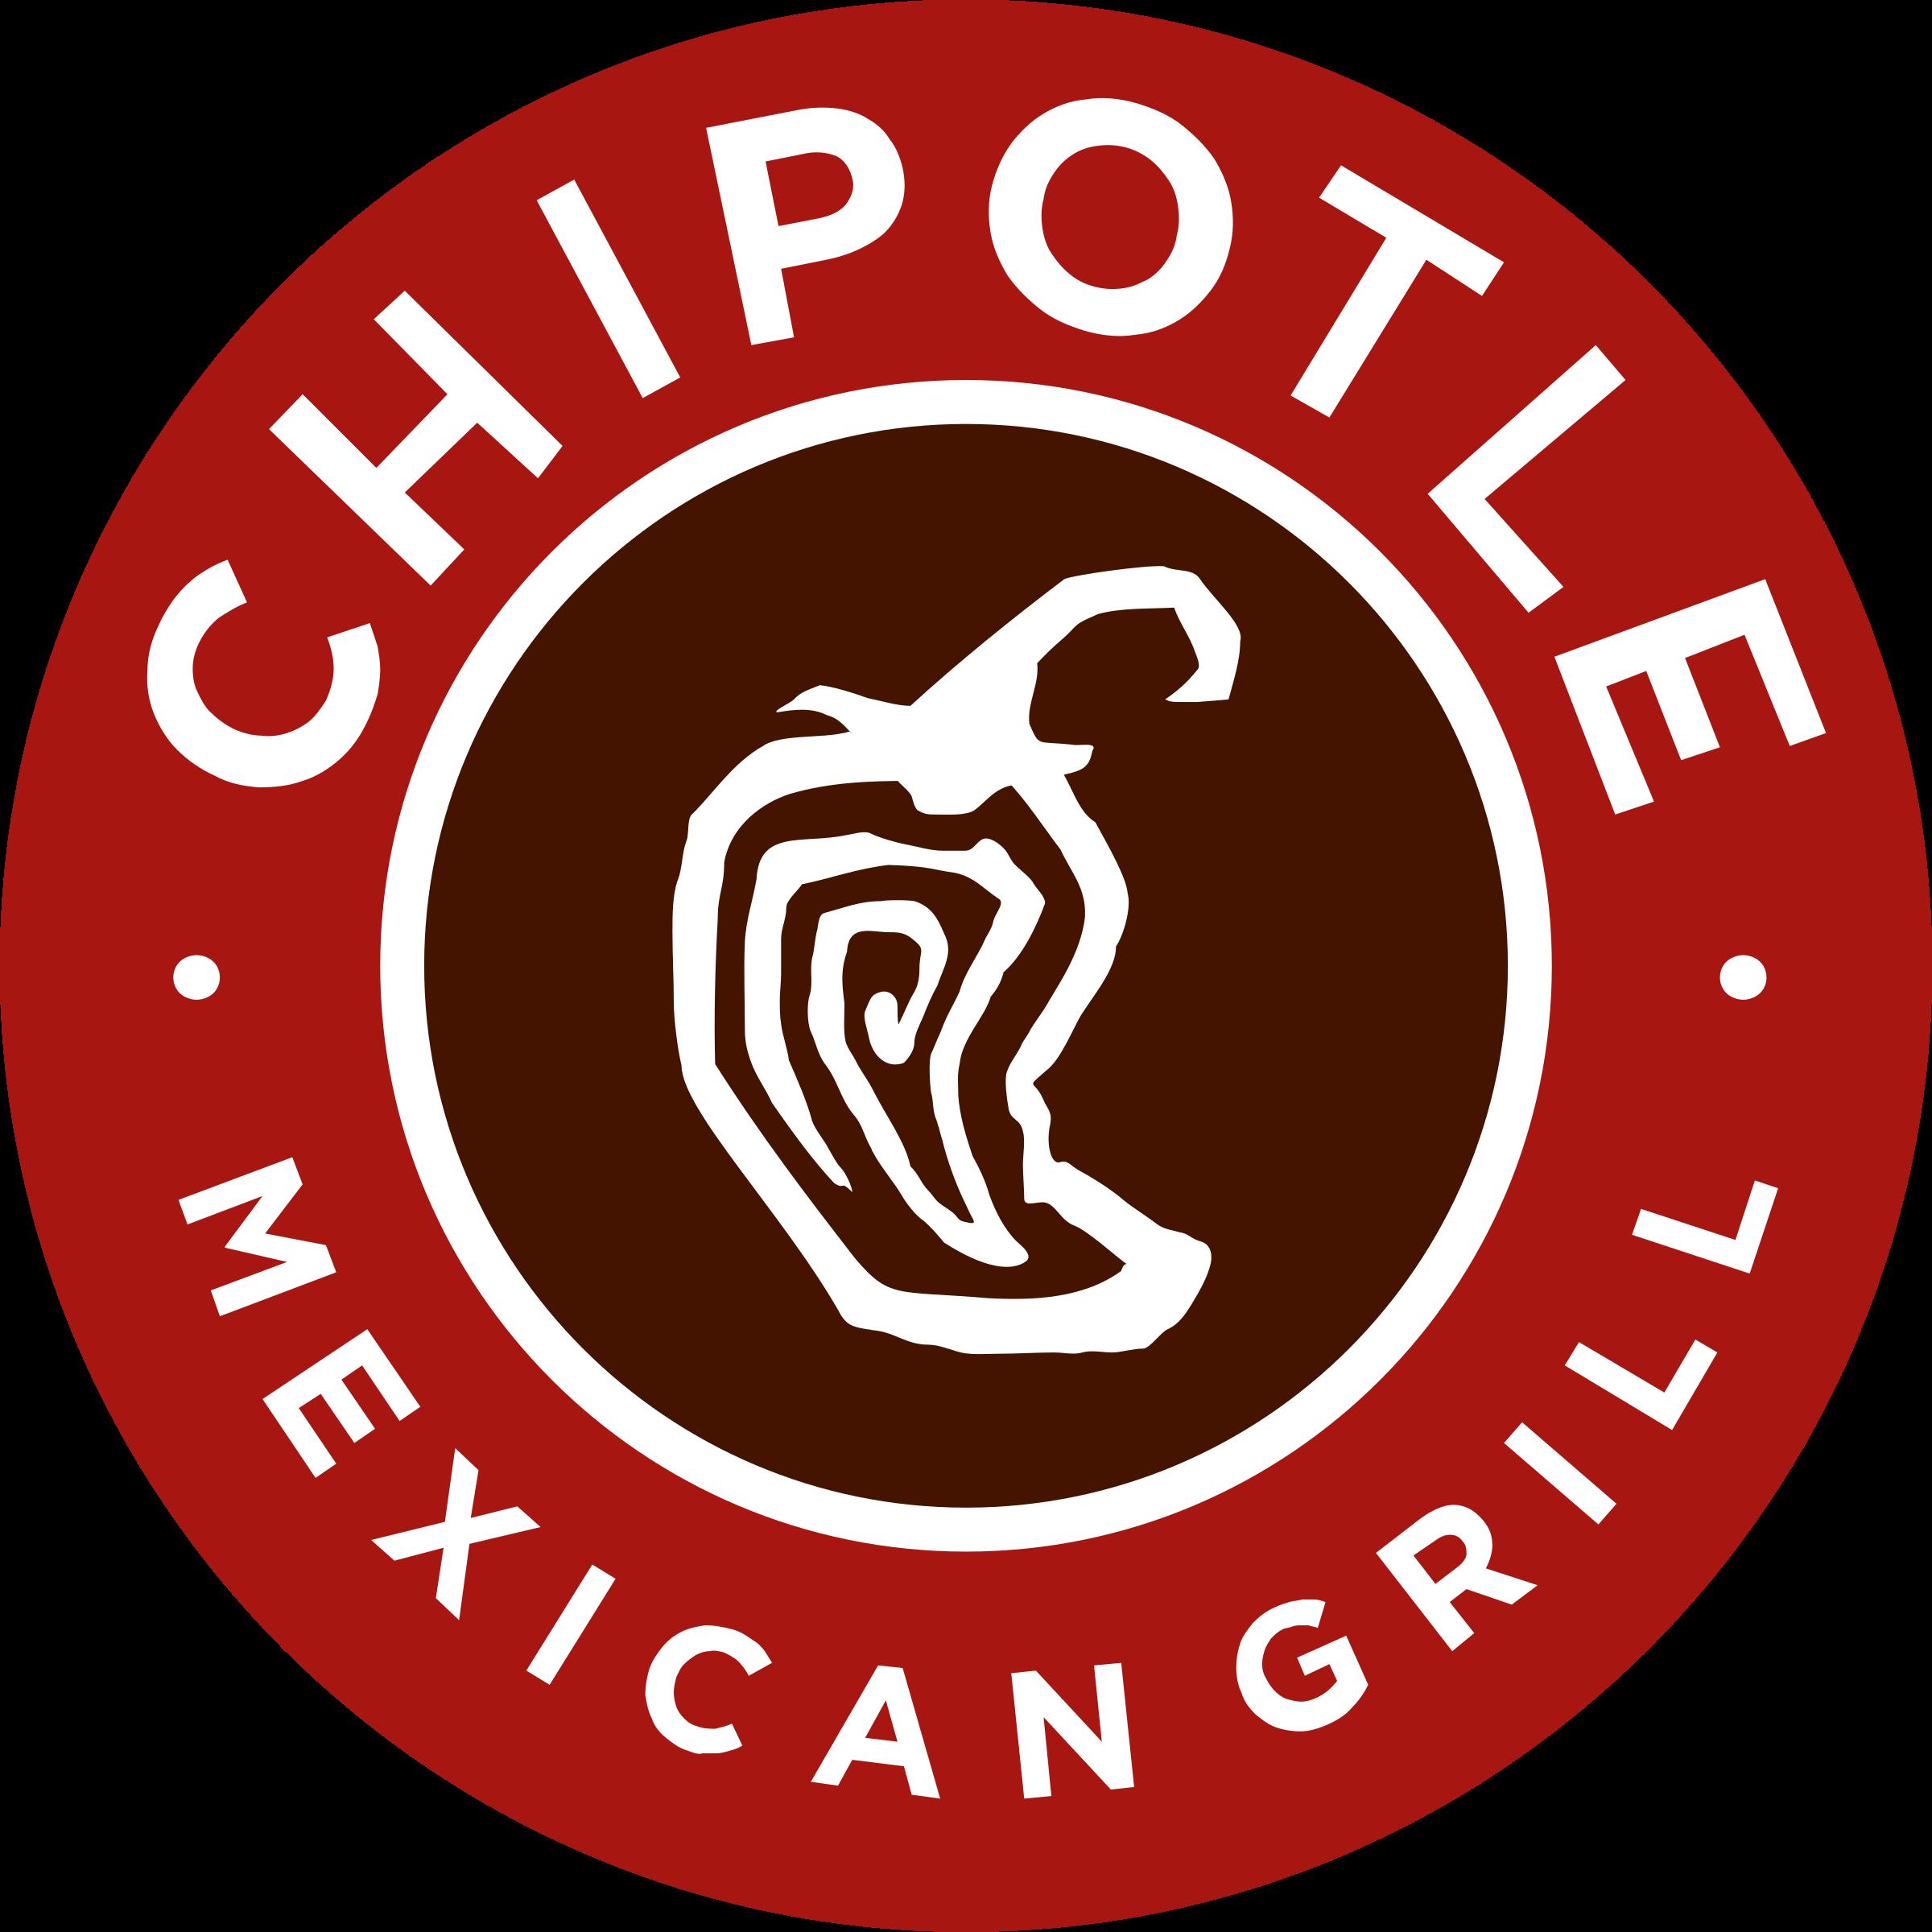 Chipotle Mexican Grill - Skibo